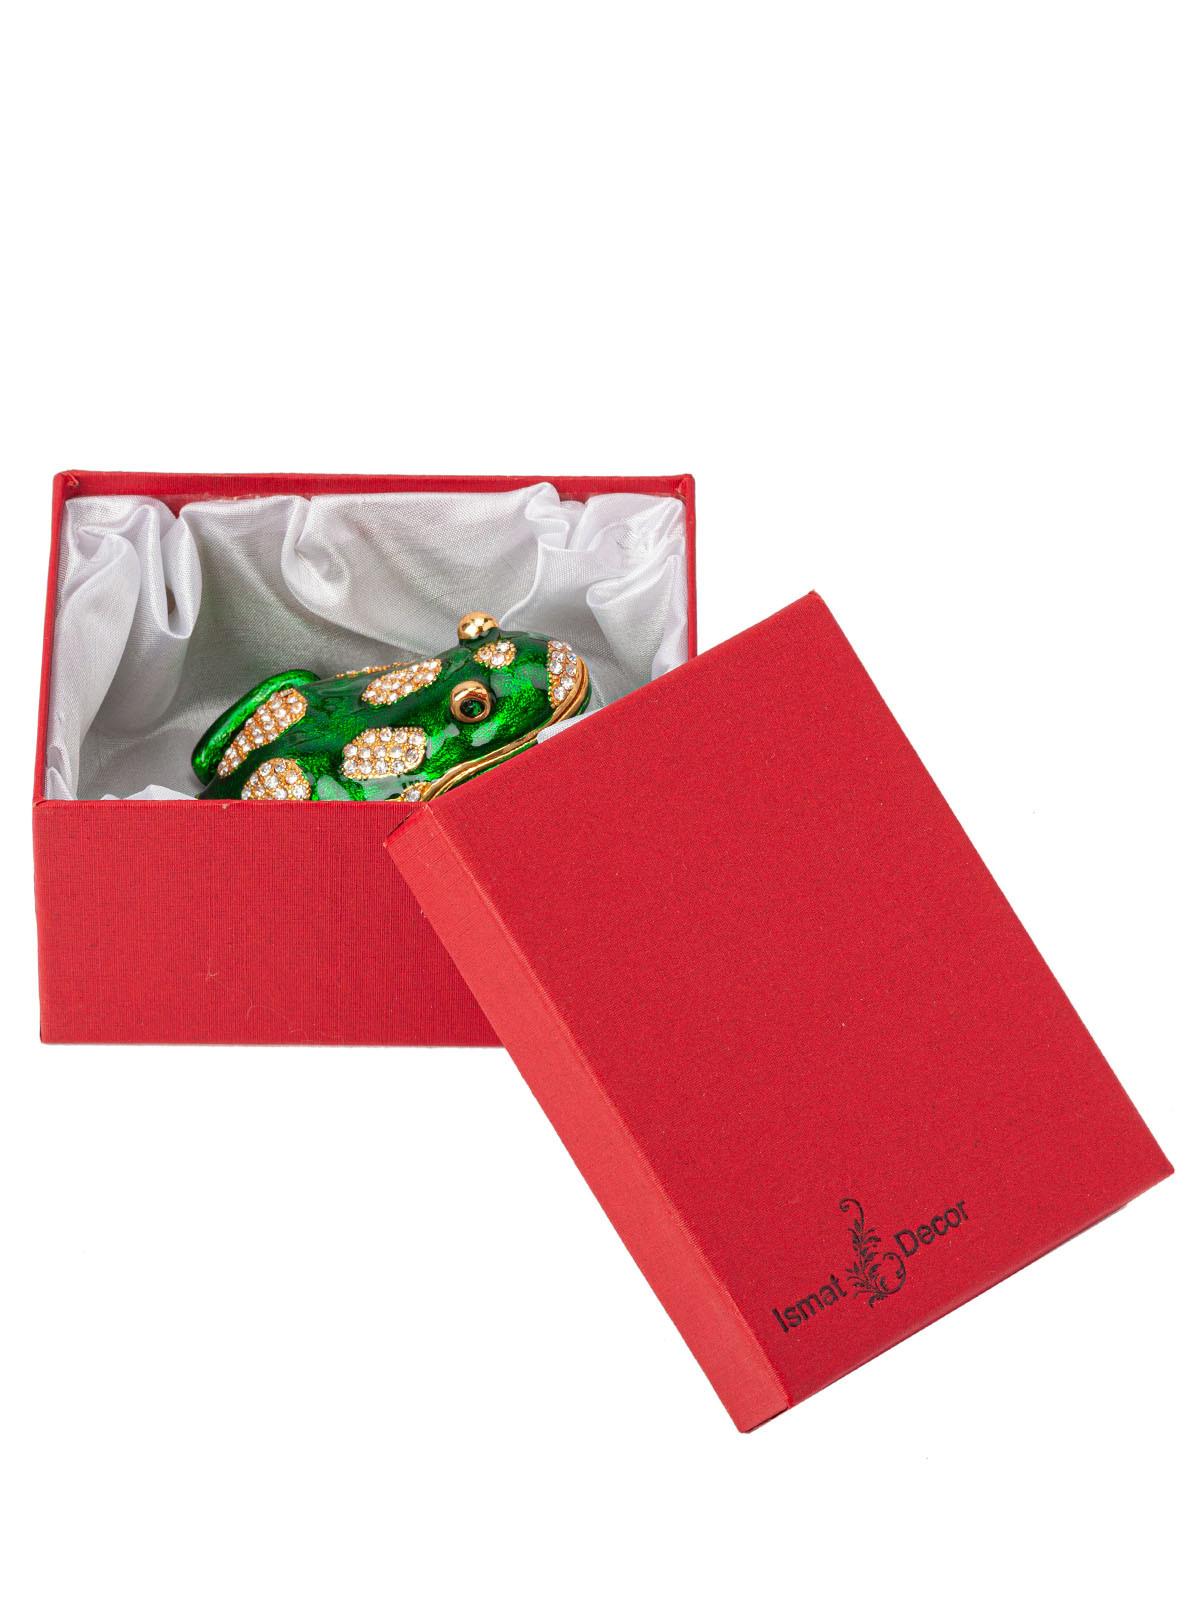 Шкатулка для украшений Лягушка S-3970 зеленый